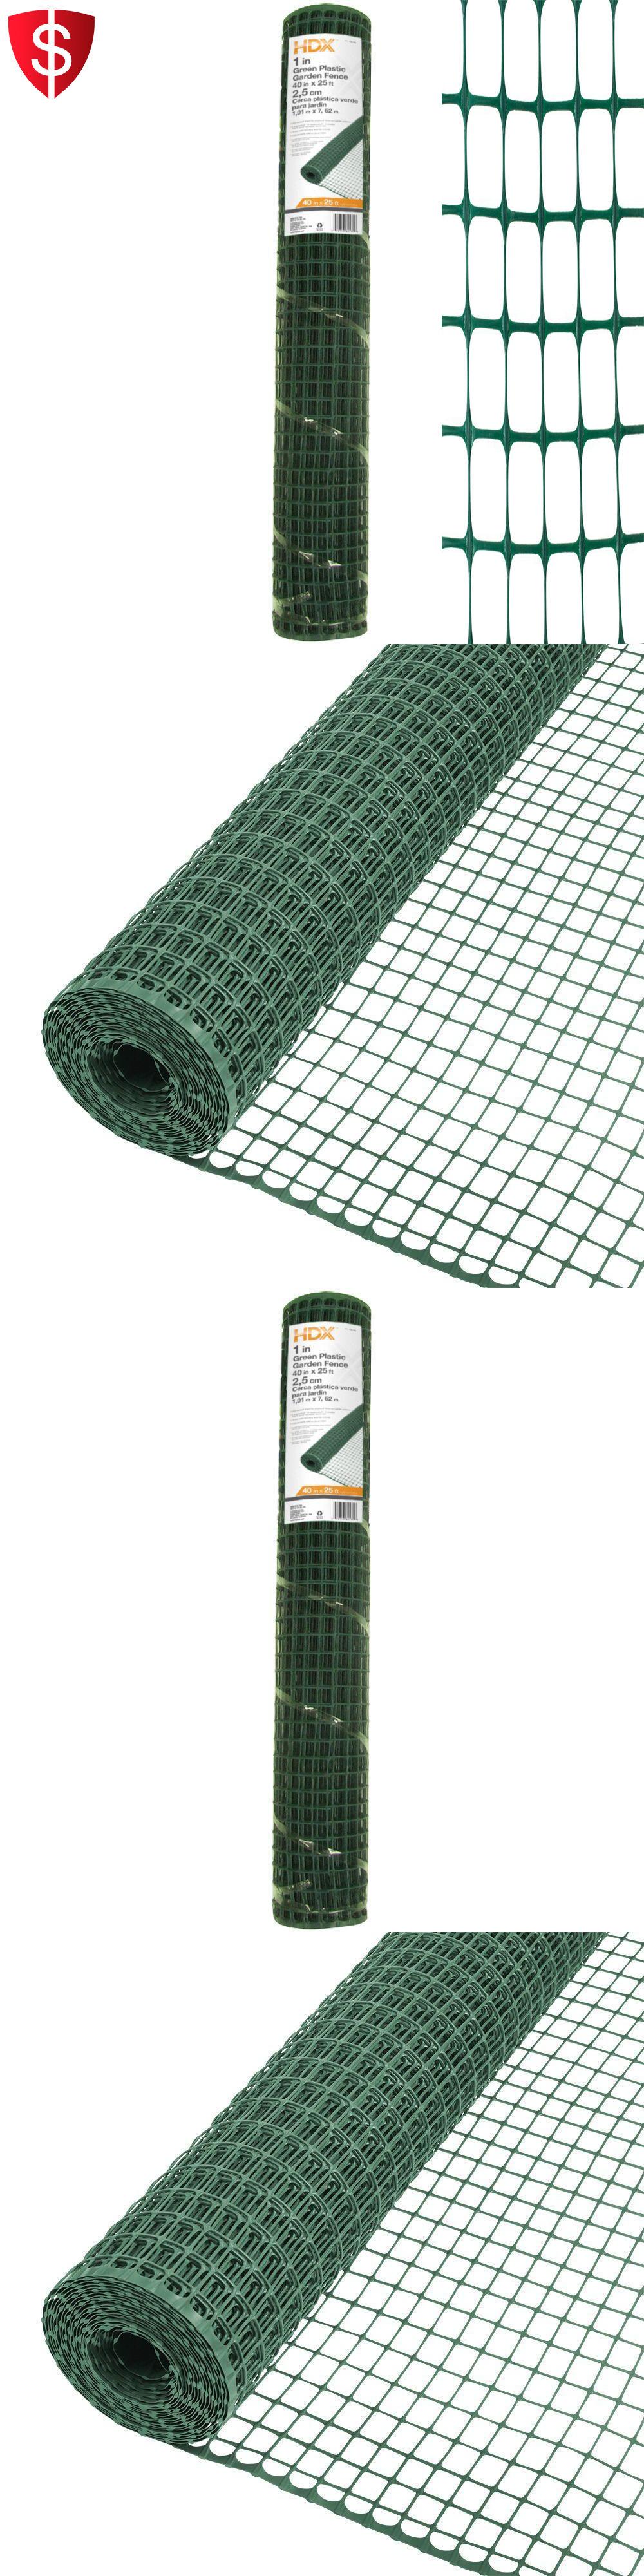 Hardware Cloth Metal Mesh 180985: Garden Fence Panels Outdoor Yard ...